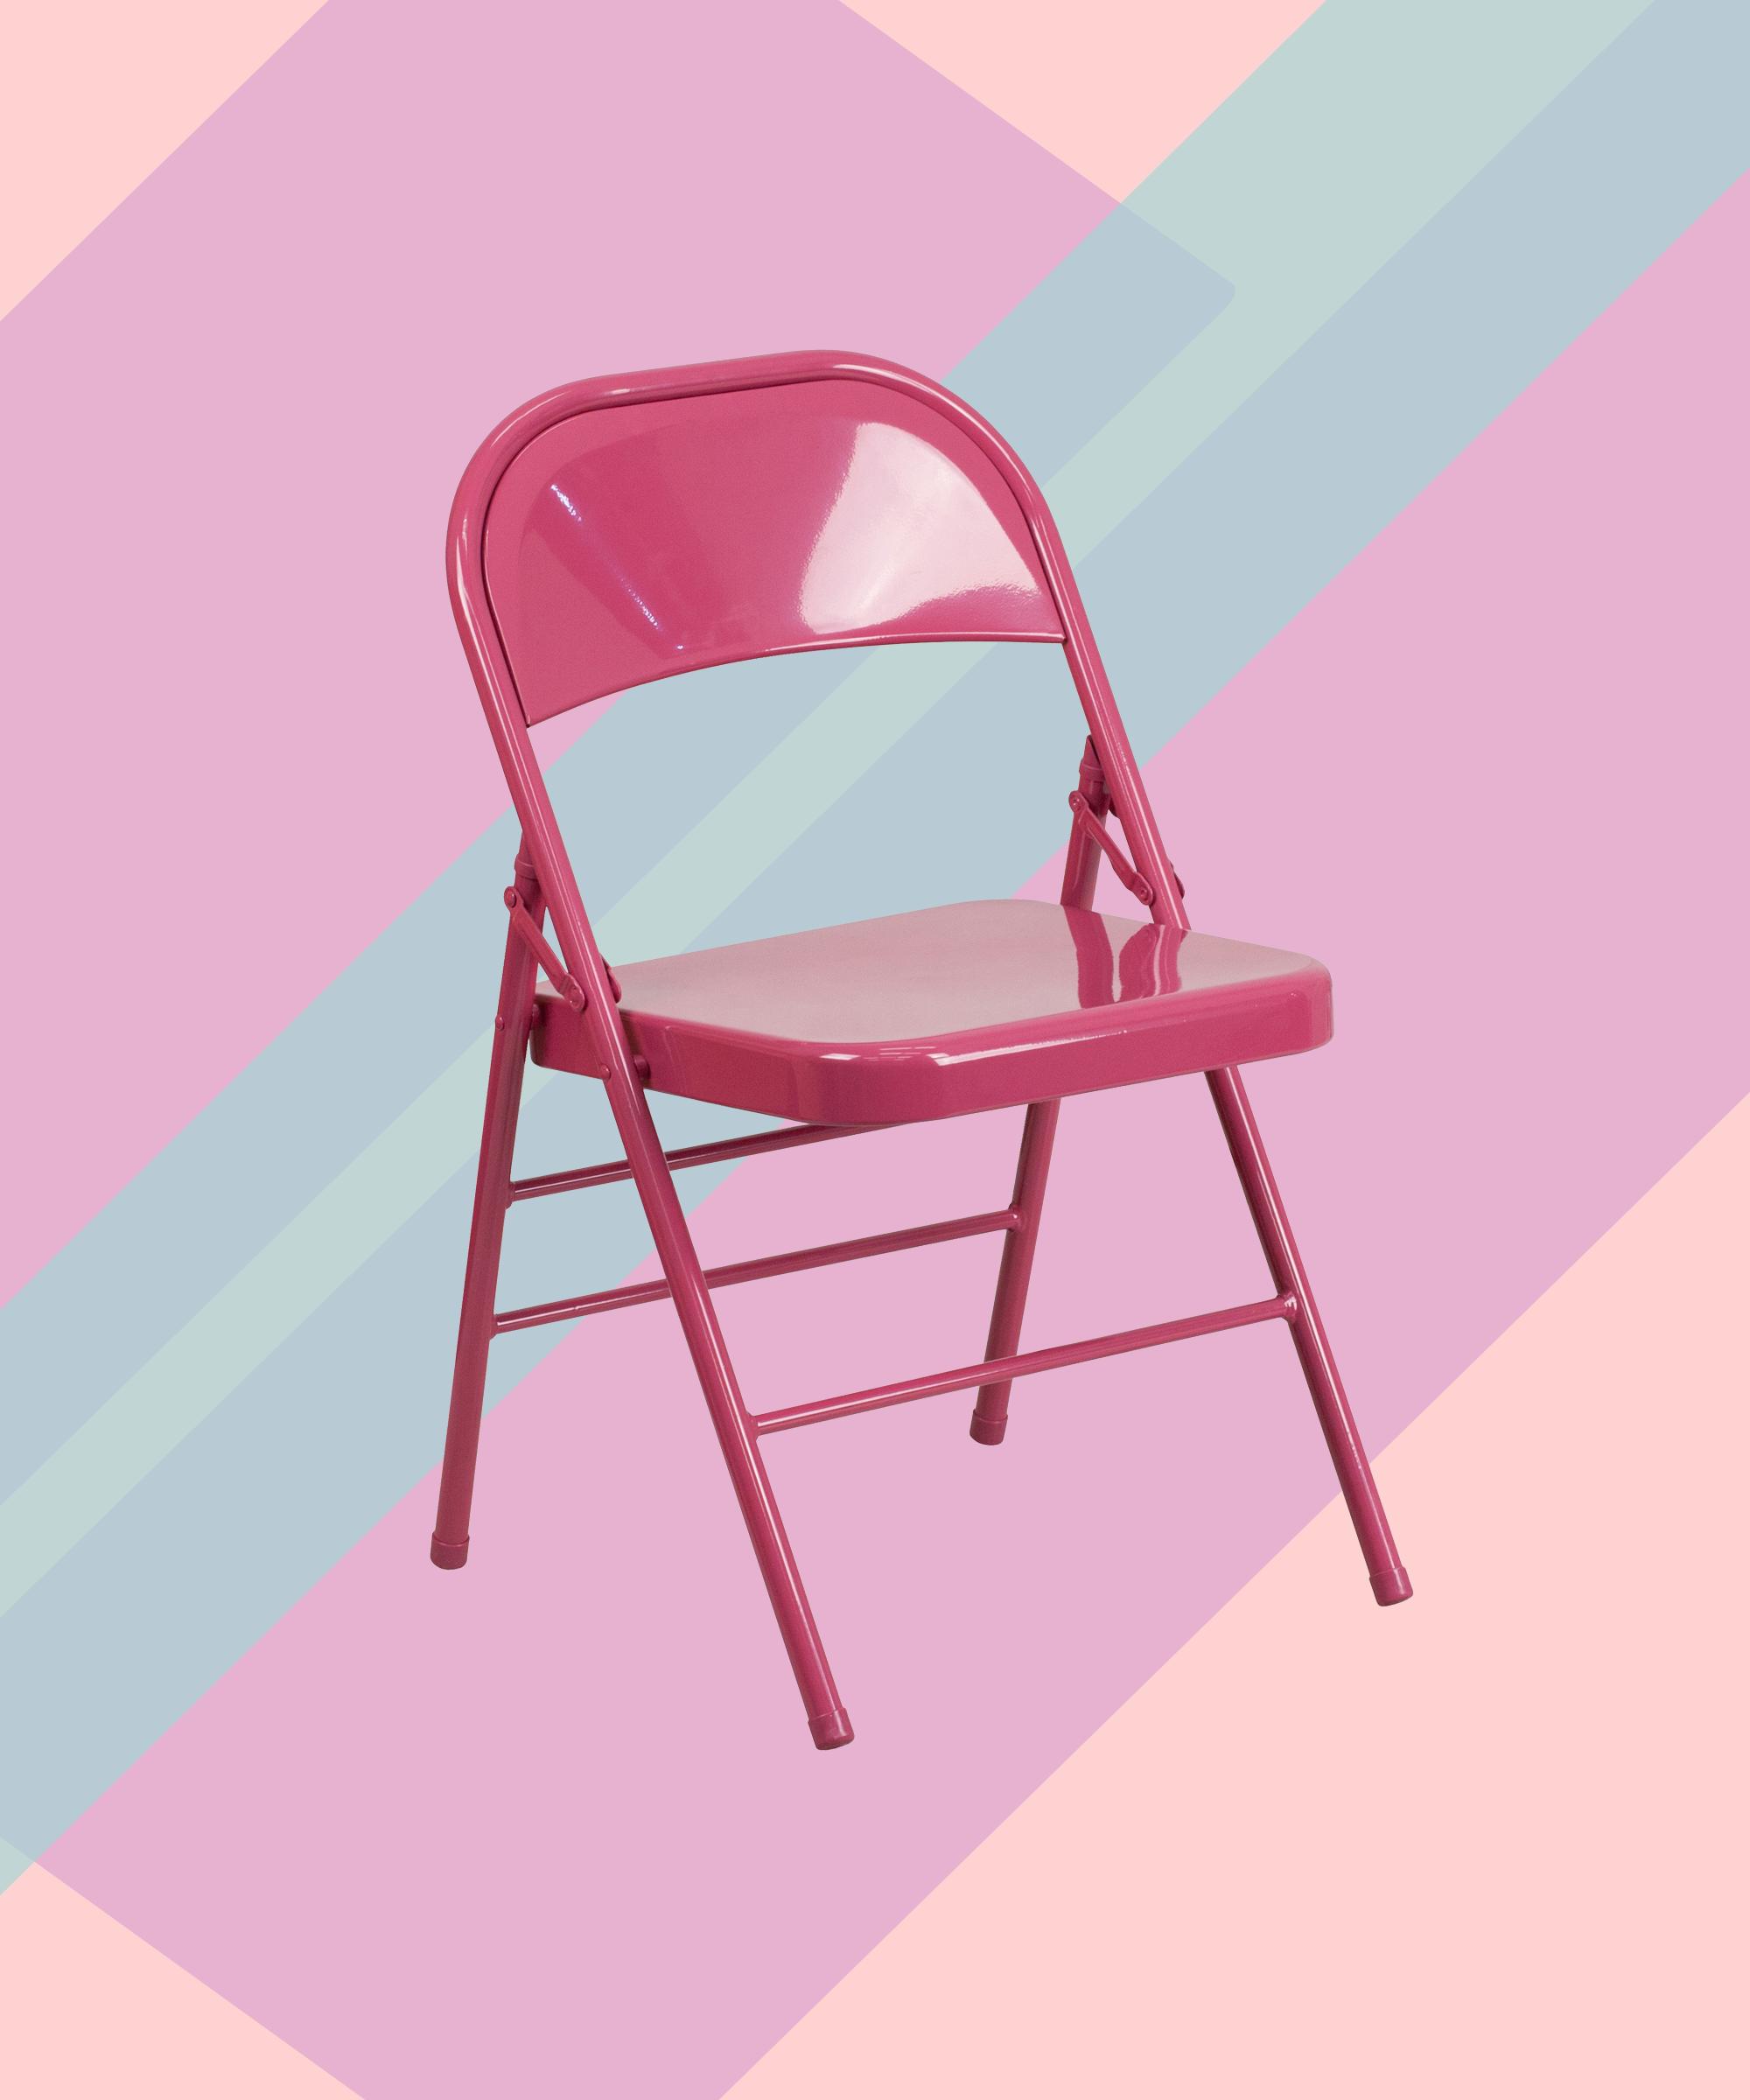 Cute Folding Chairs Best Space Saving Summer Furniture